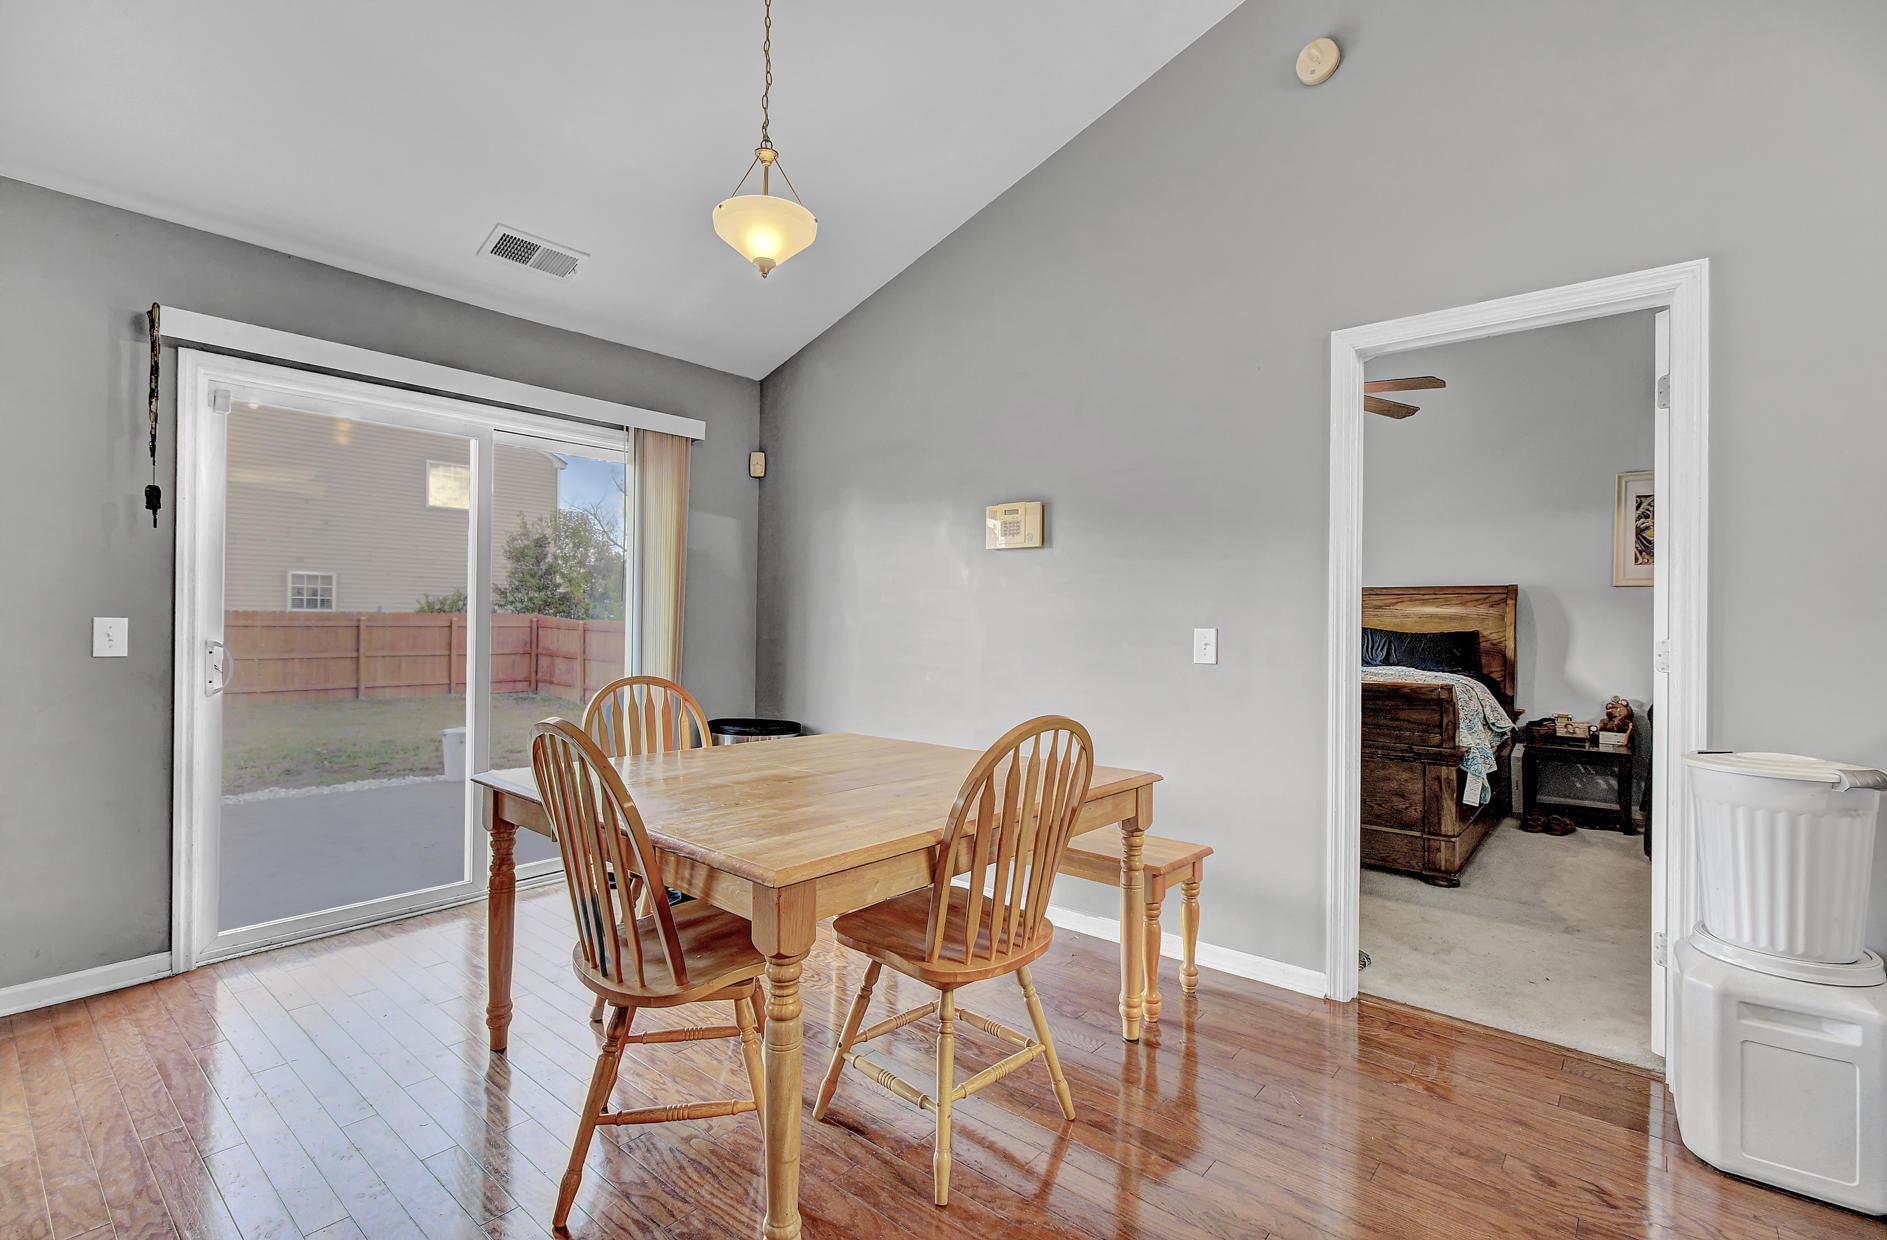 Oakley Pointe Homes For Sale - 231 Silk Oak, Moncks Corner, SC - 3